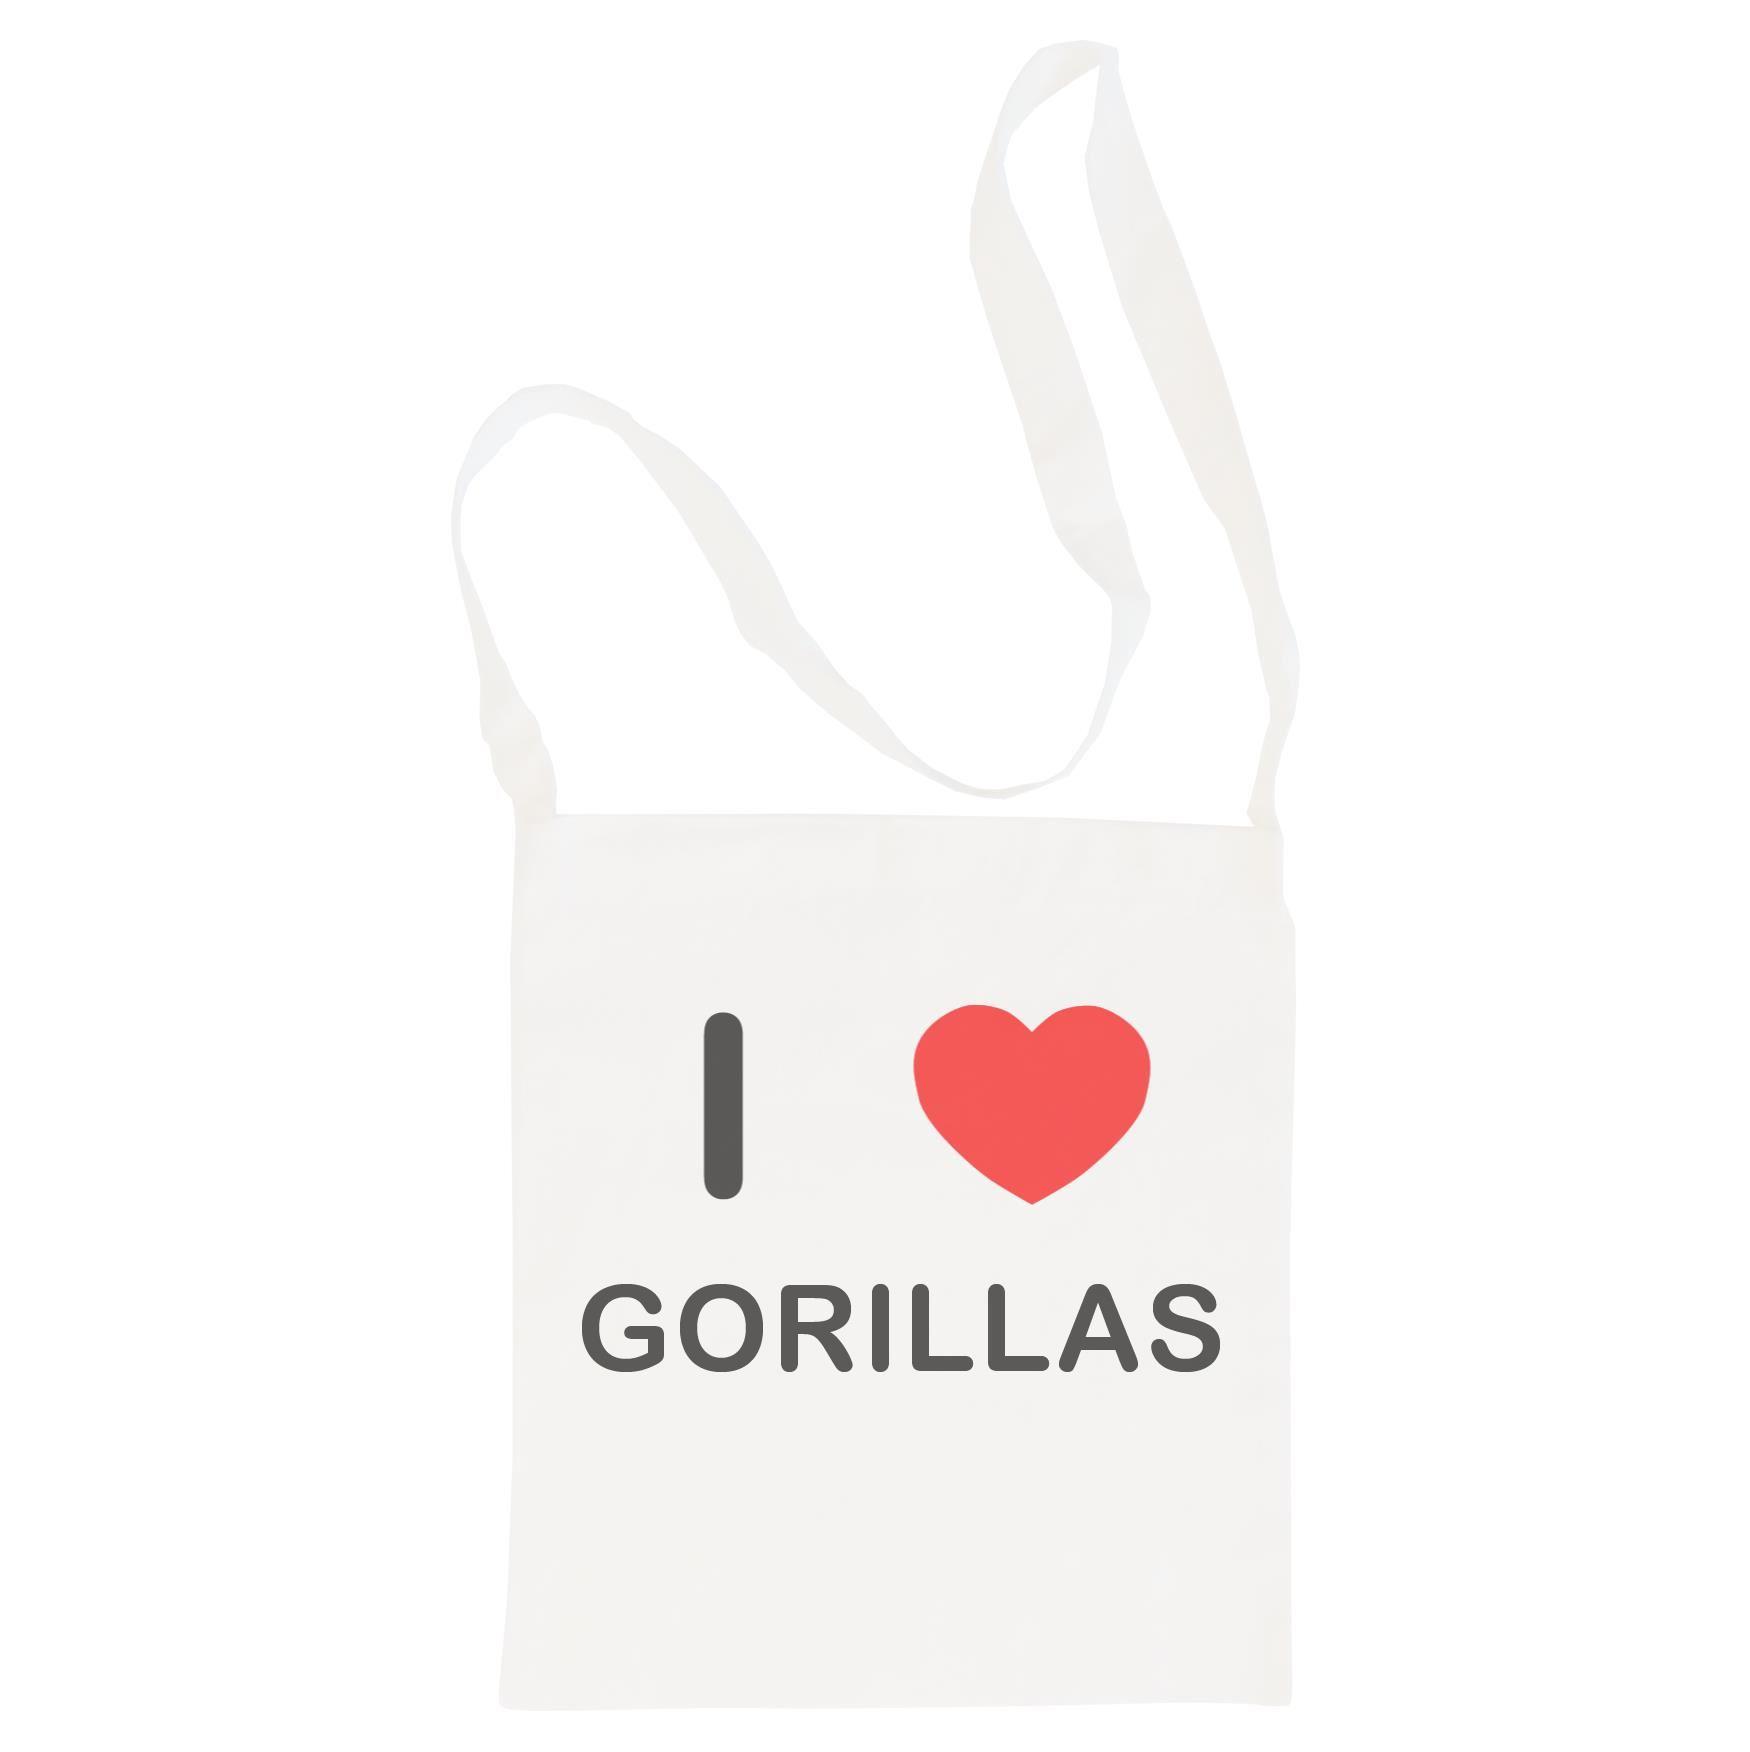 I Love Gorillas - Cotton Bag | Size choice Tote, Shopper or Sling